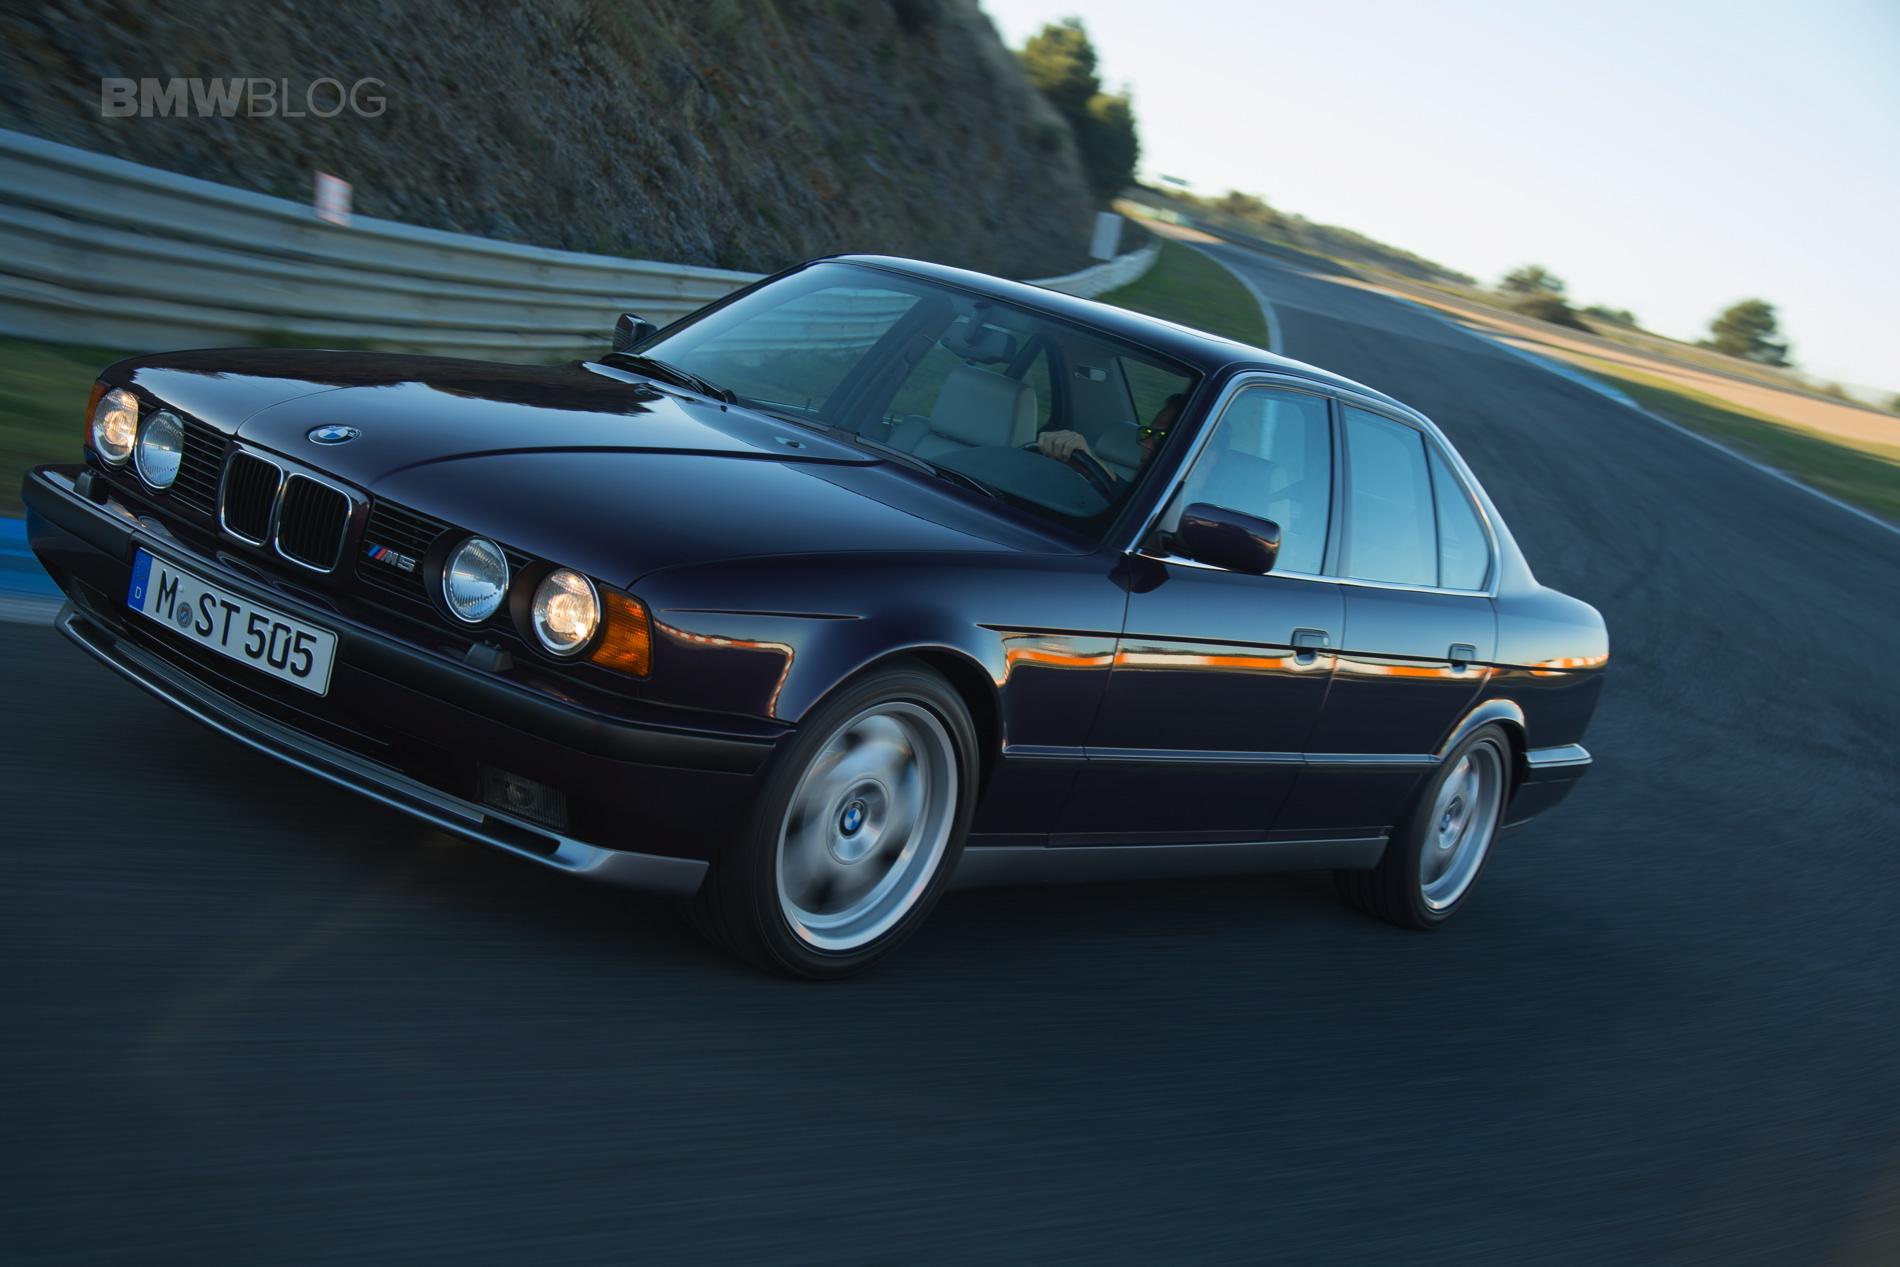 BMW E34 M5 photos 05